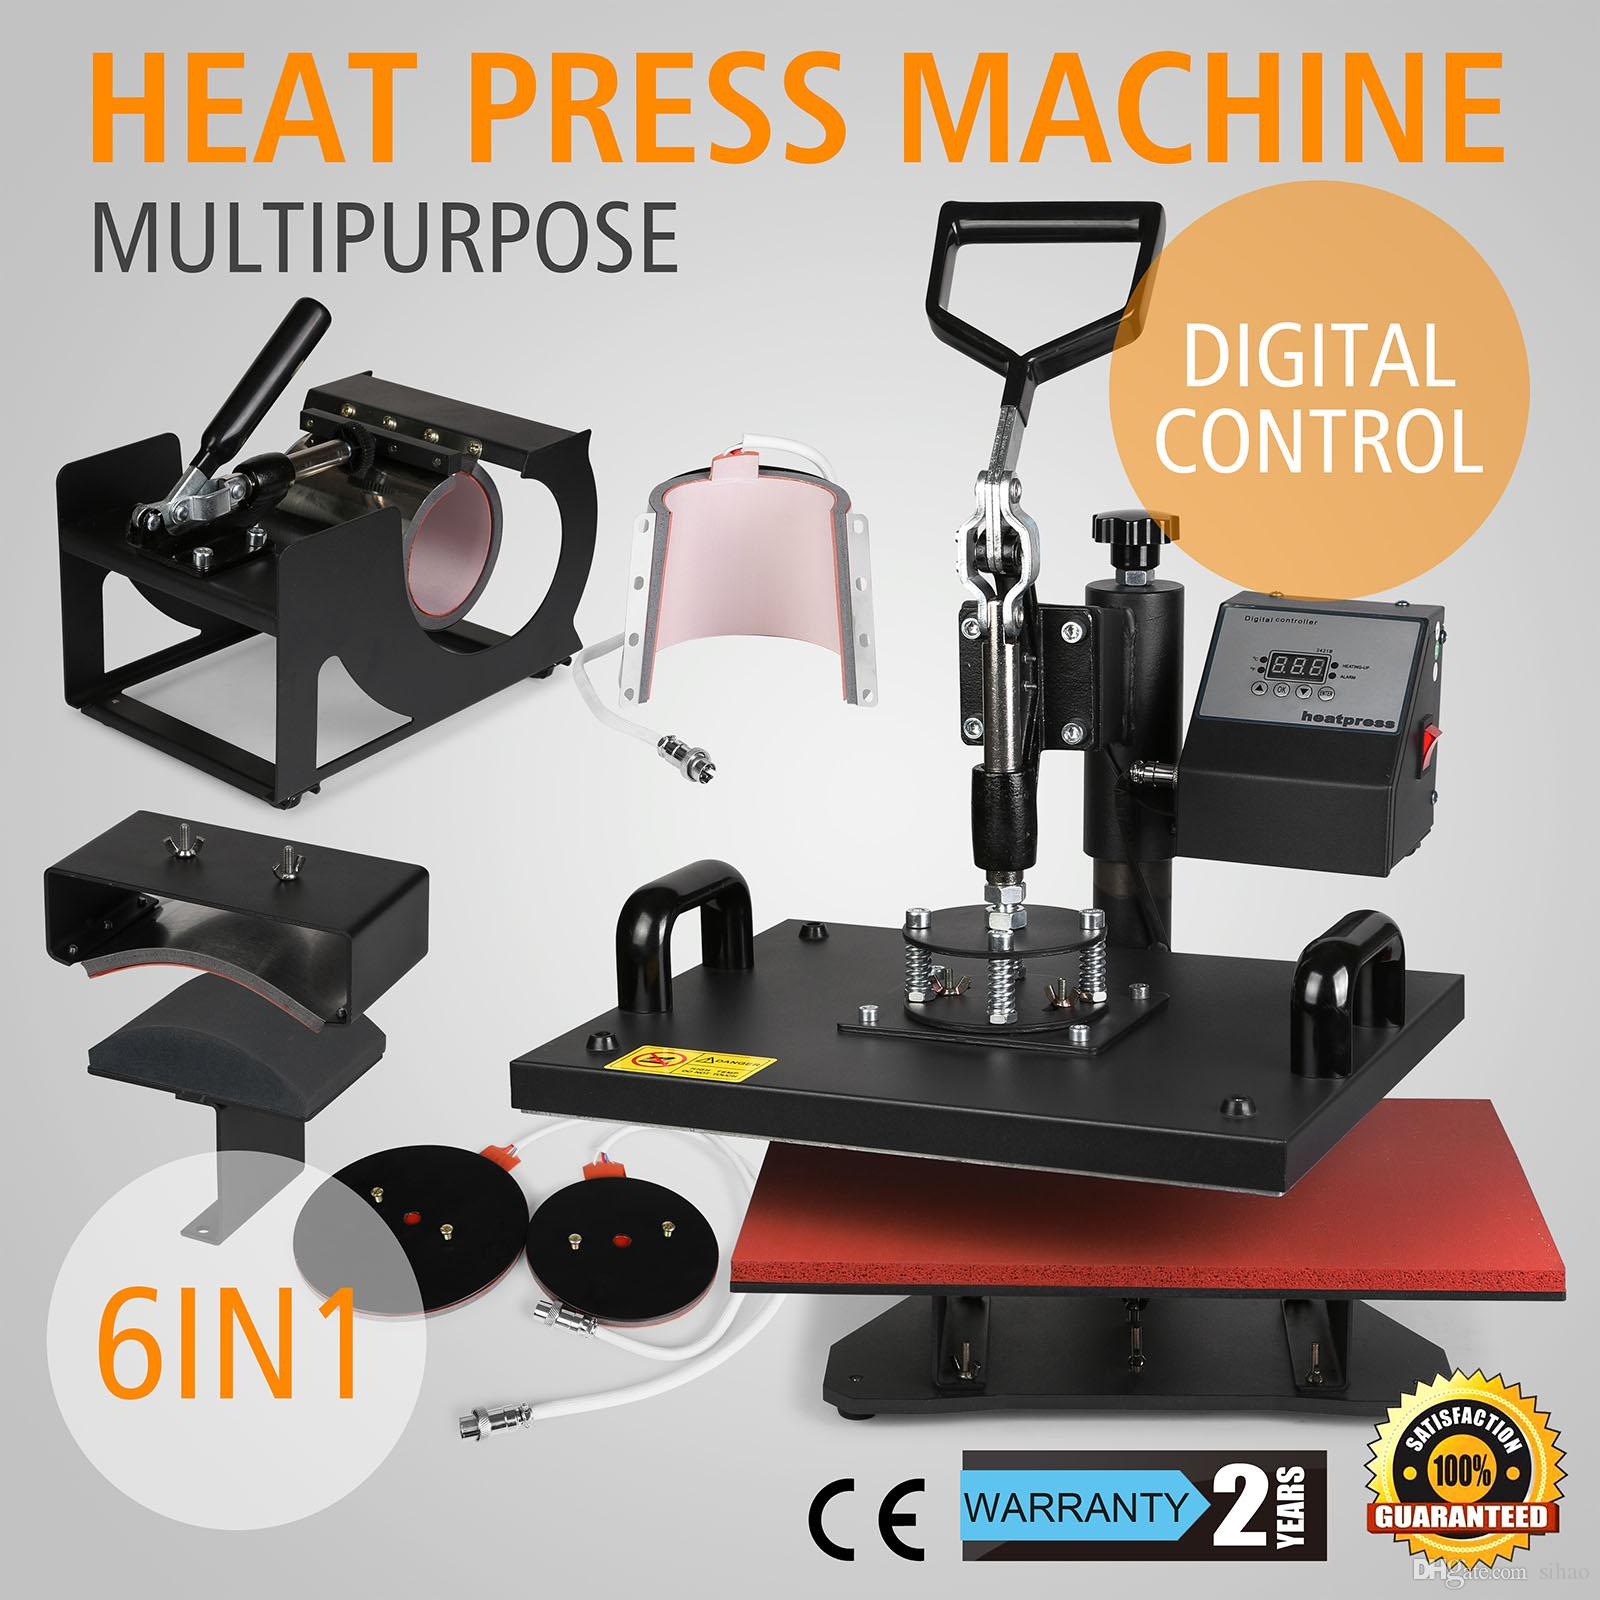 Best Low Price 6 In 1 Digital Heat Press Machine Multifunctional ...